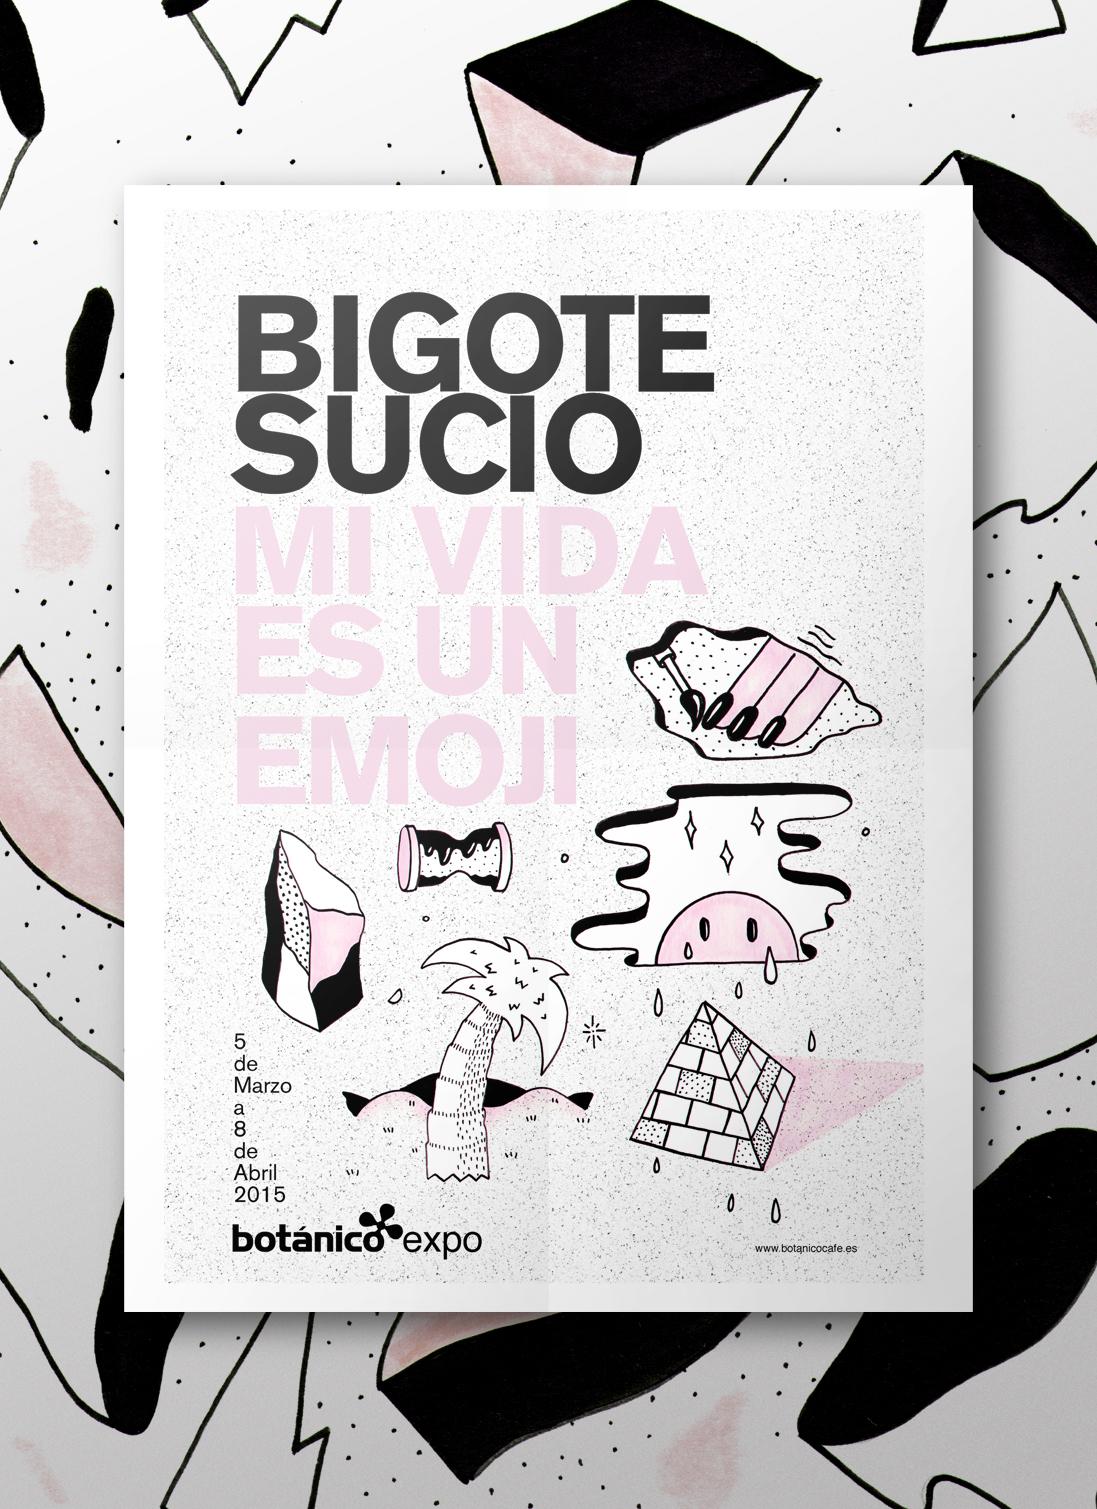 cartel expo botanico bigotesucio.JPG